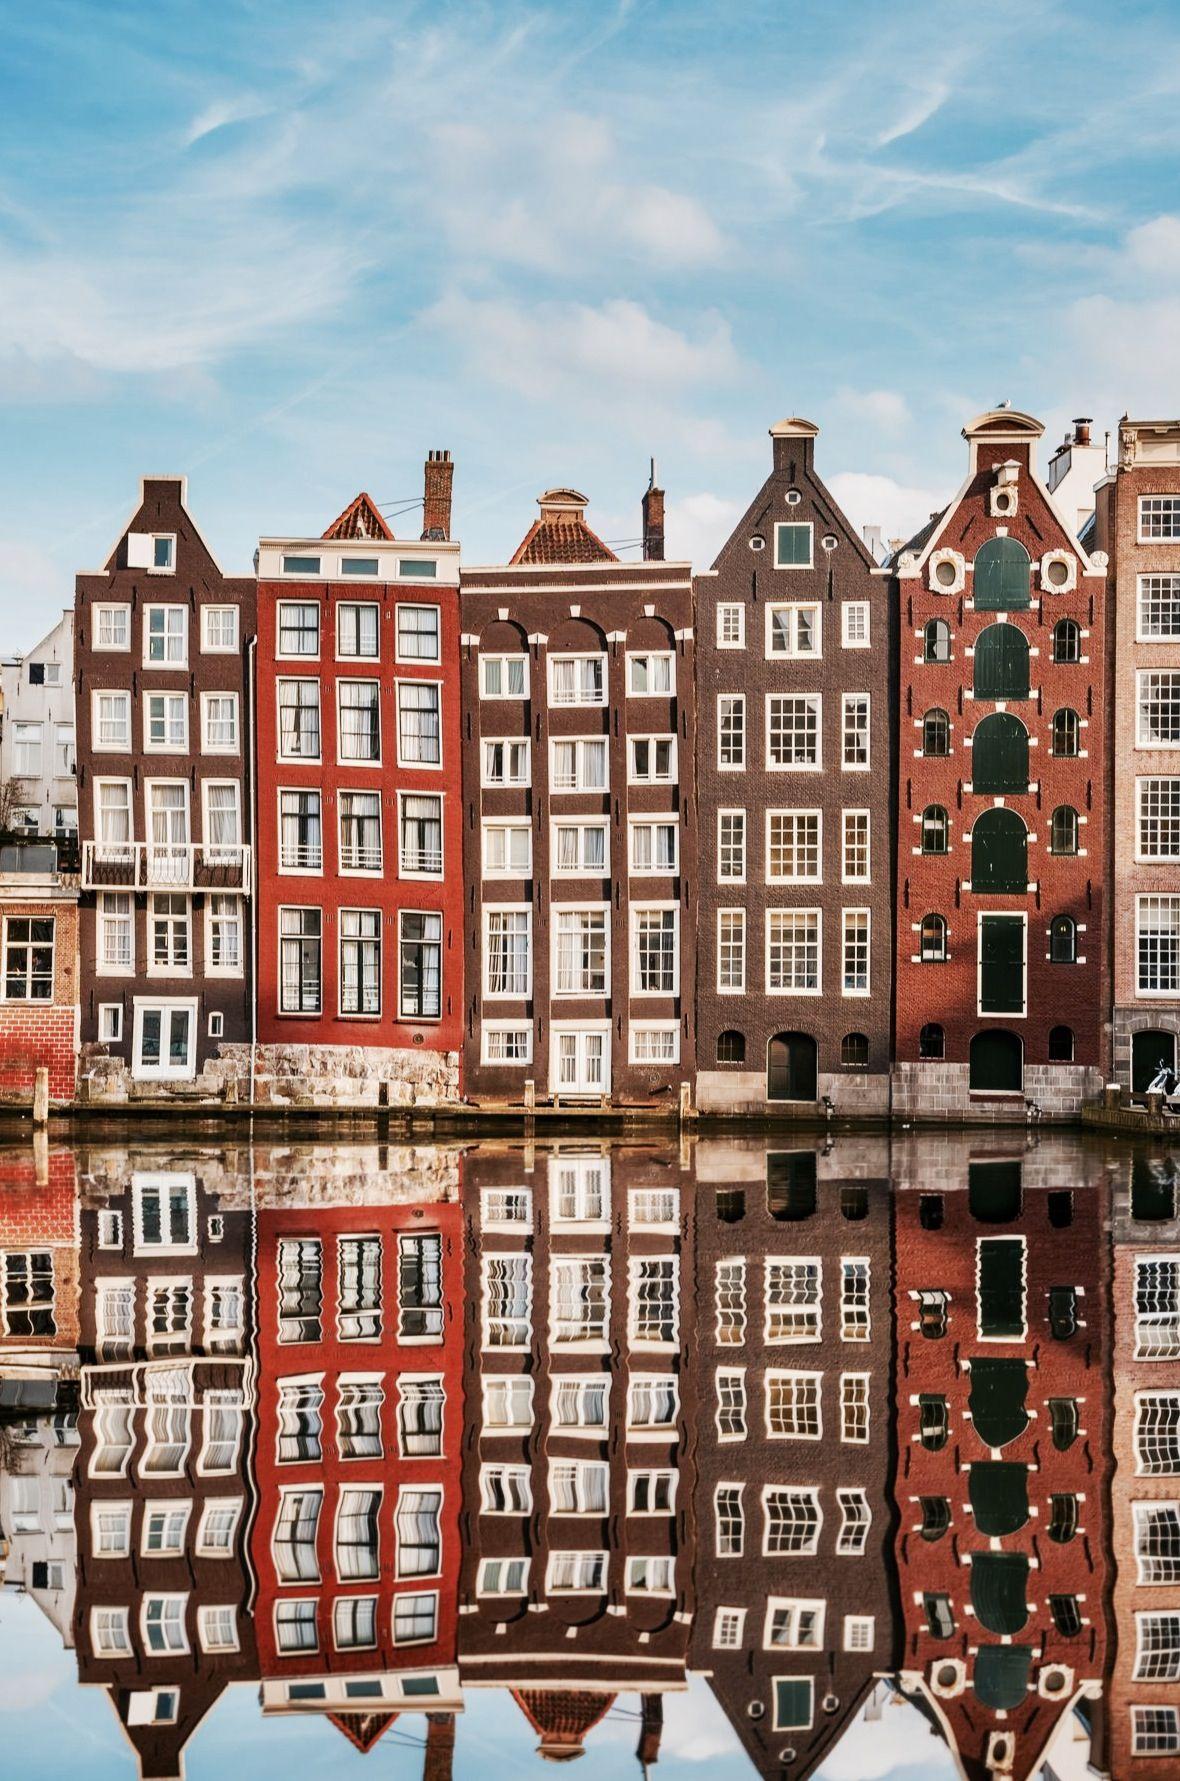 Amsterdam, Netherlands. reflection! contrast of building vs. sky colors.